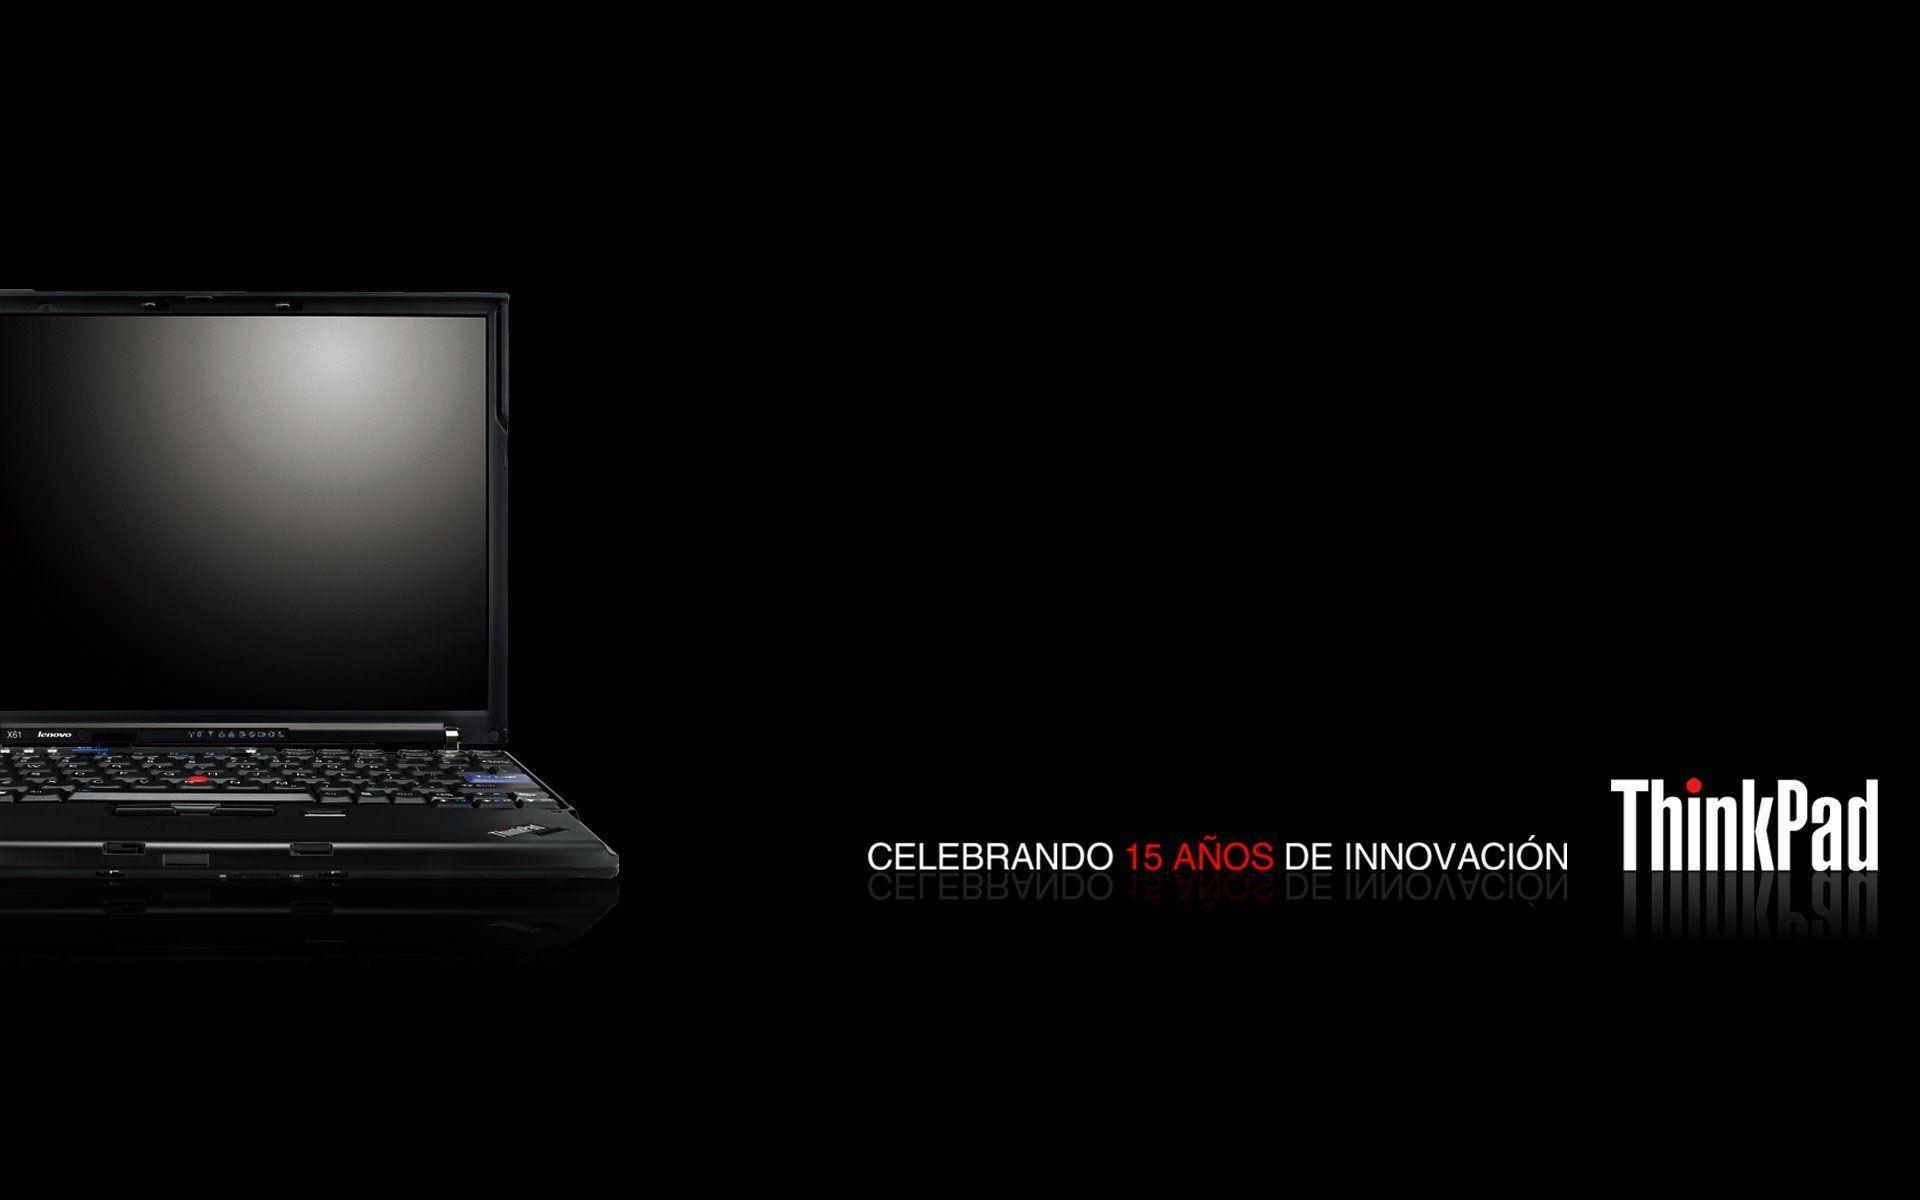 Lenovo Black Wallpapers - Top Free Lenovo Black Backgrounds